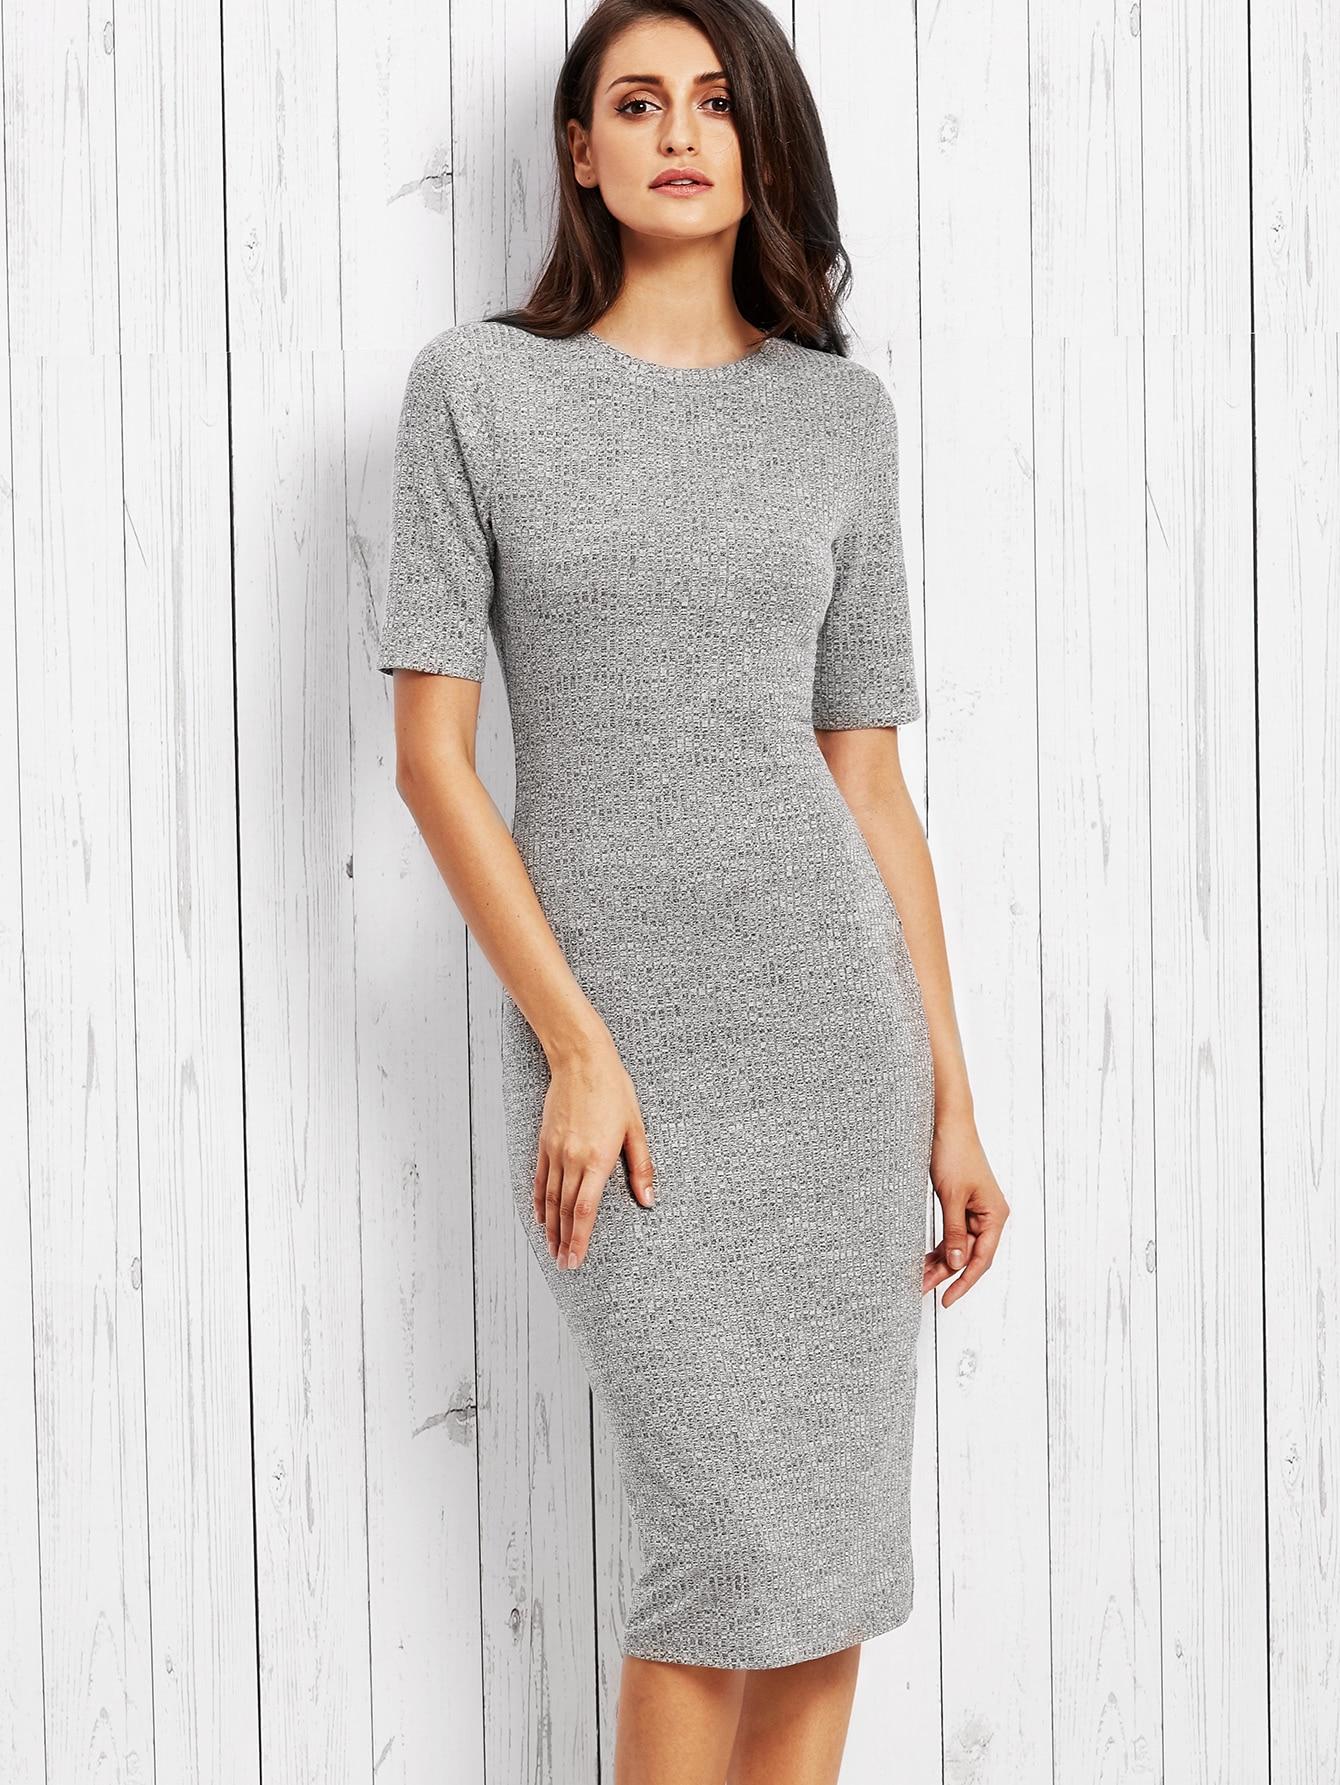 Ribbed Pencil Dress dress160826702